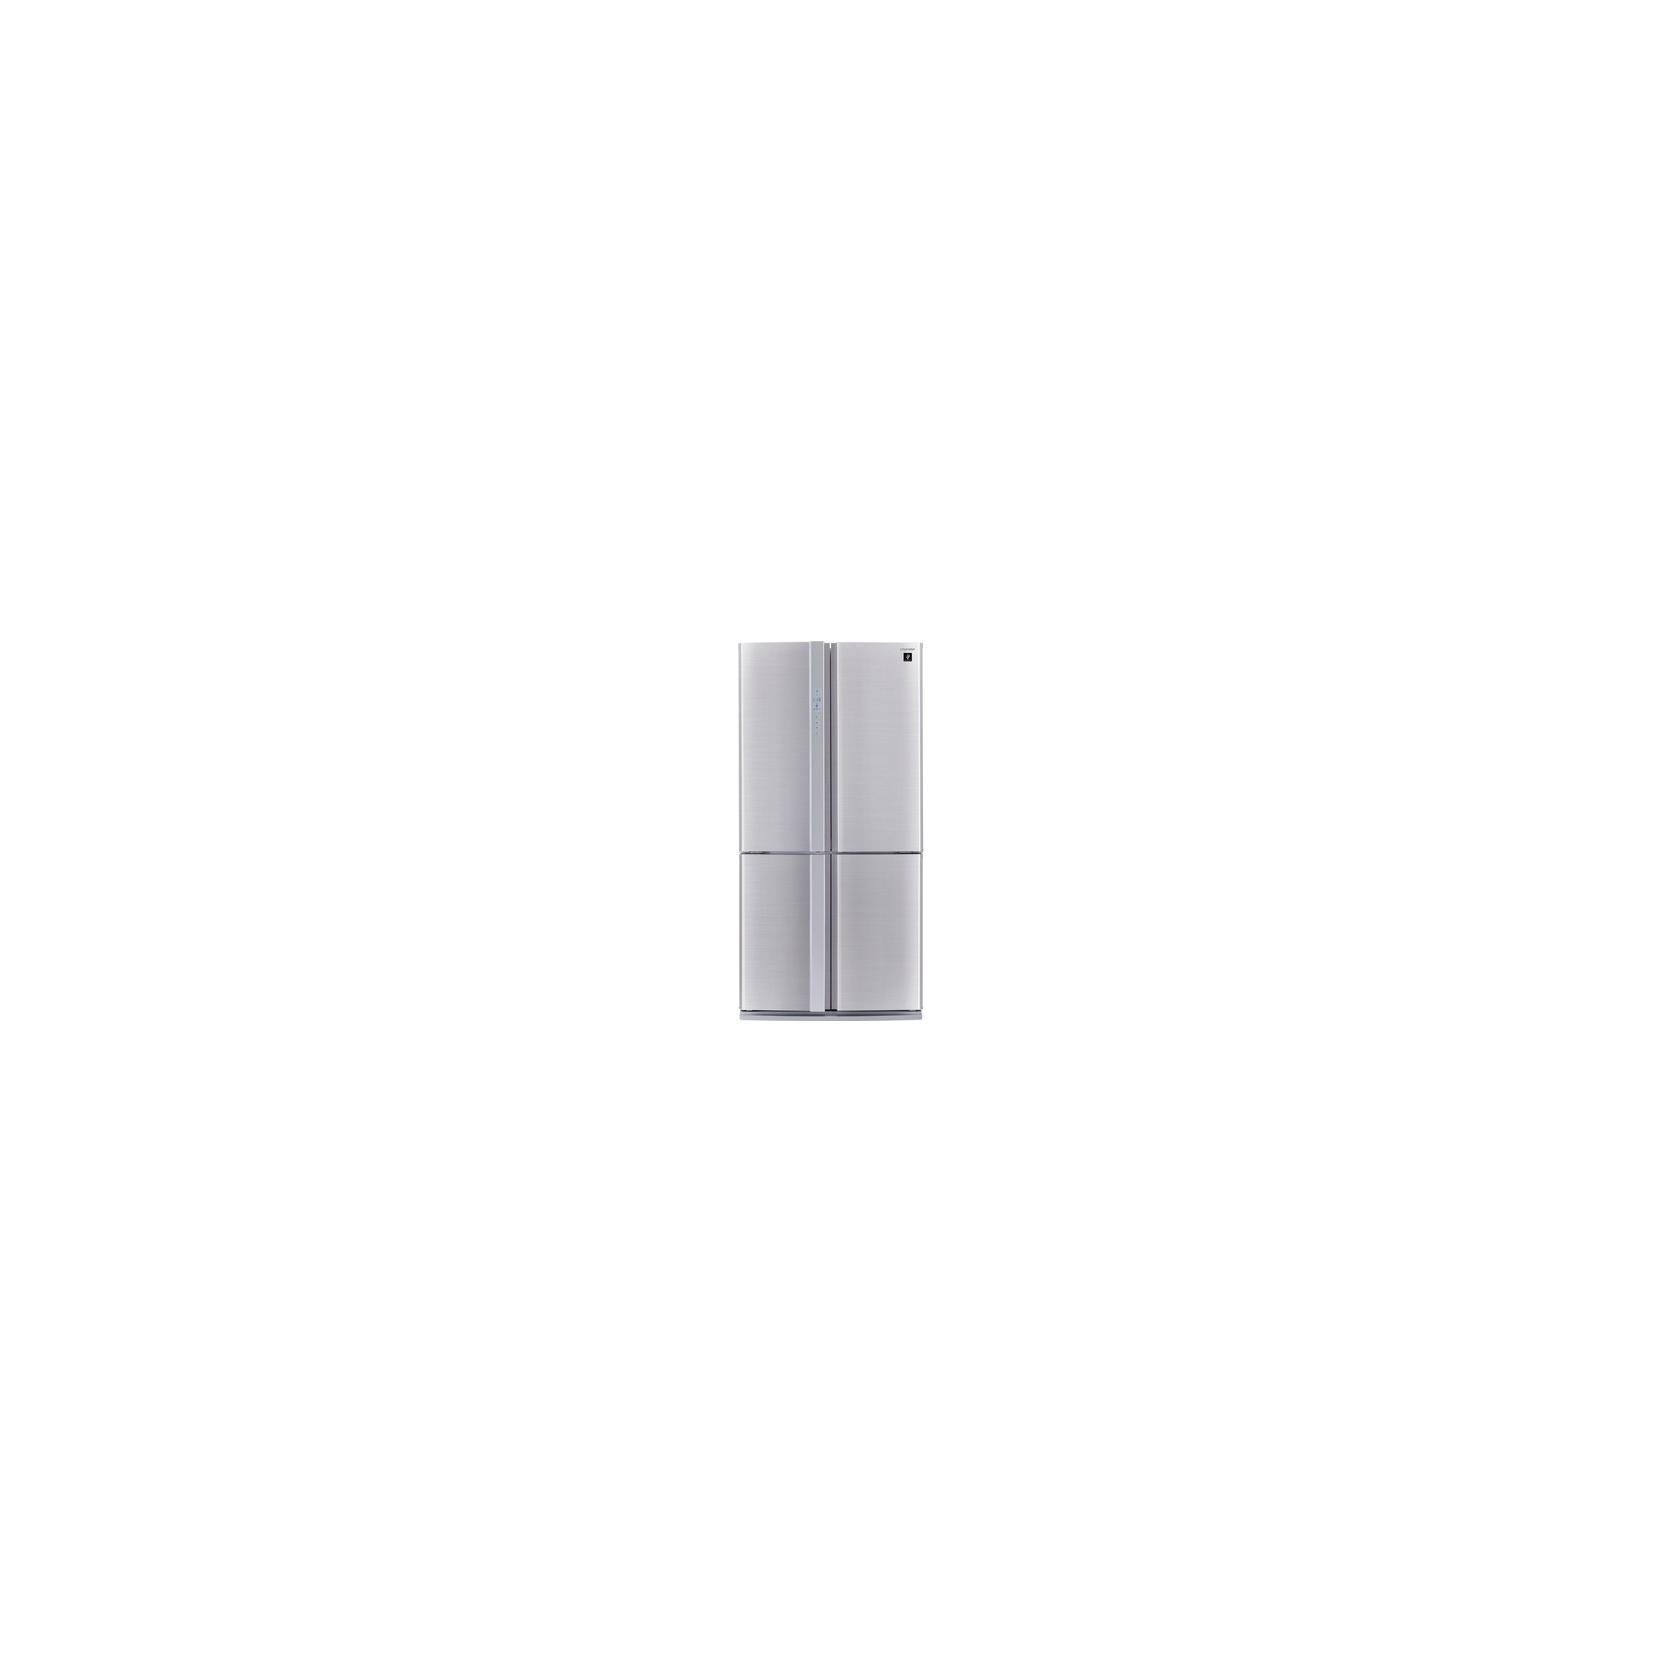 Sharp frigo side by side sj fp810vst 4 porte no frost for Sharp frigoriferi 4 porte